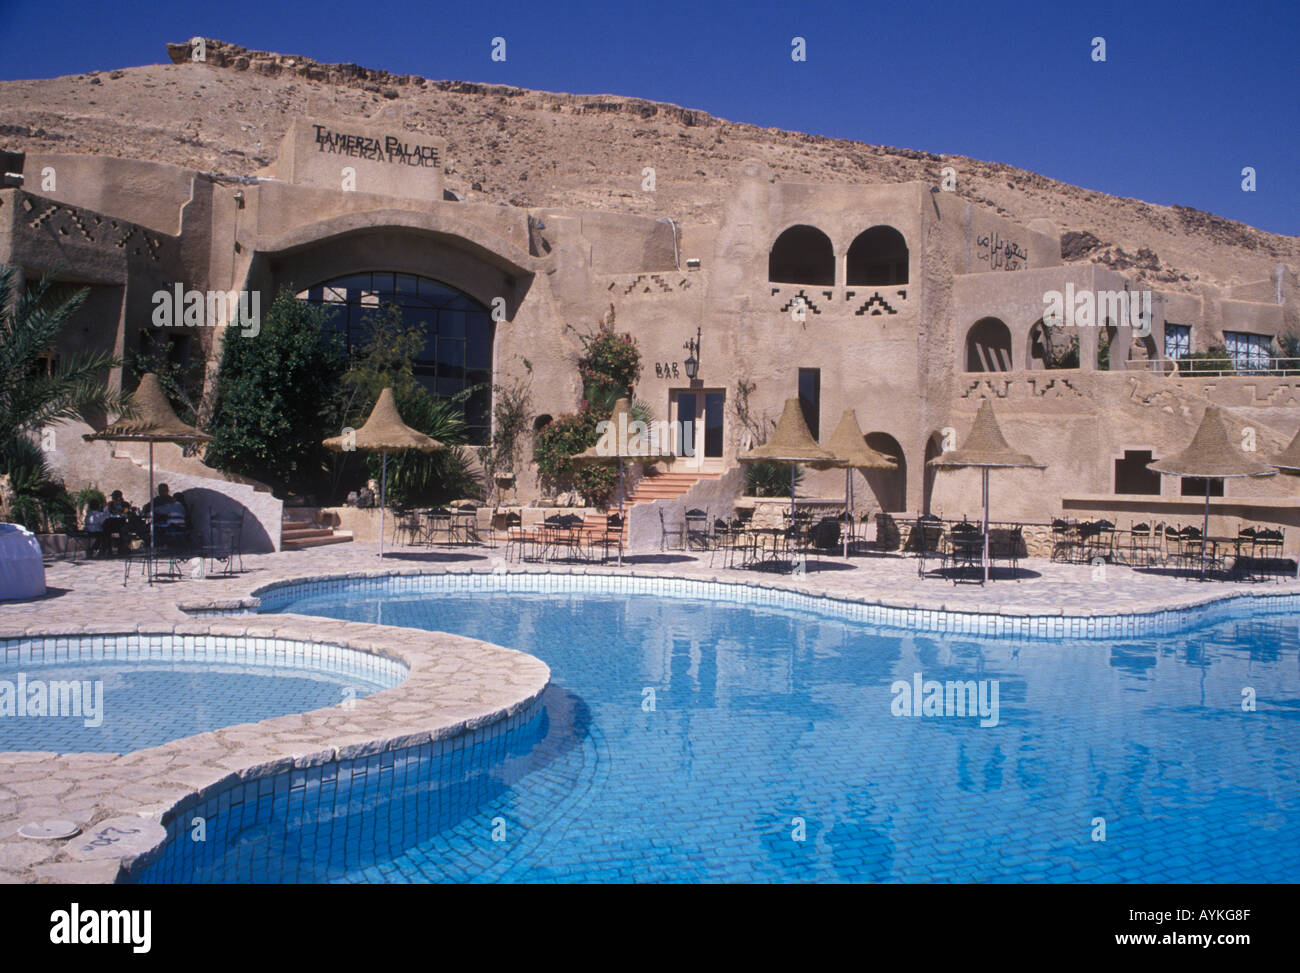 Swimming Pool Tamerza Palace Hotel Tamerza Tunisia Stock Photo Royalty Free Image 5592206 Alamy